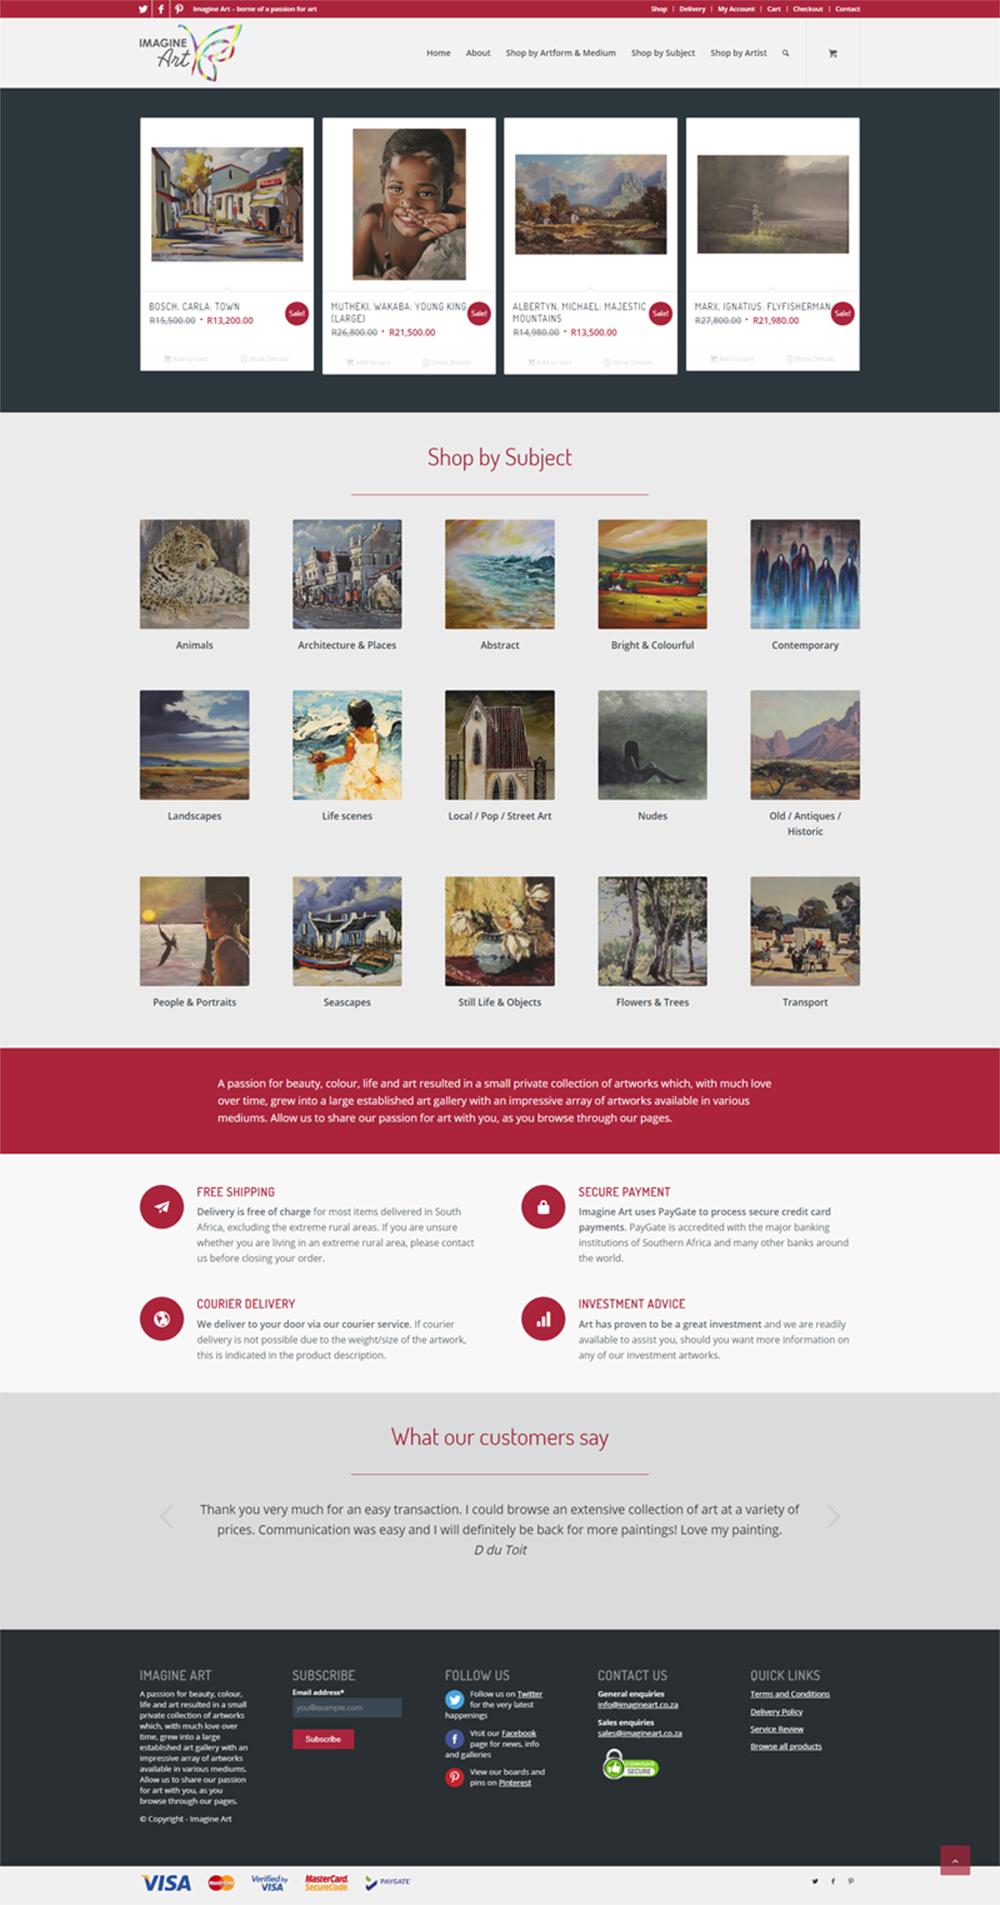 Imagine Art website home page